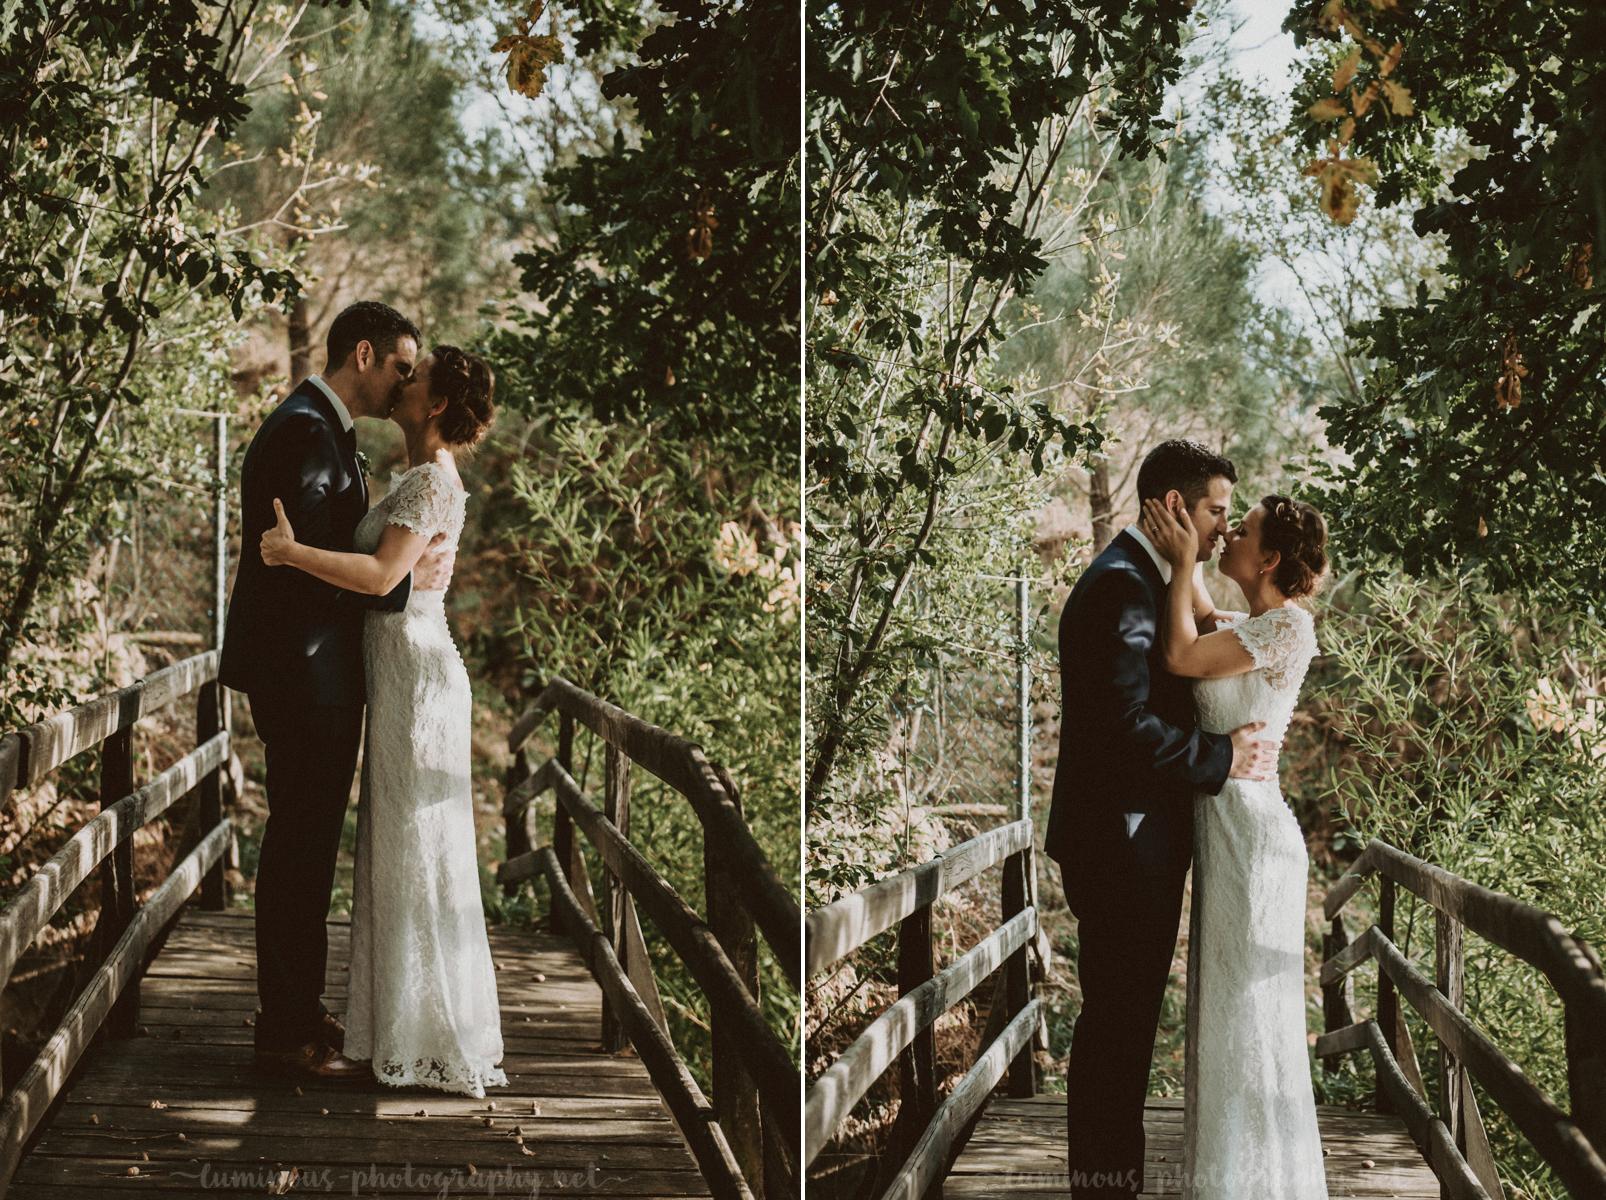 casamento-wedding-luminous-photography-porto-karolina-pedro-304.jpg